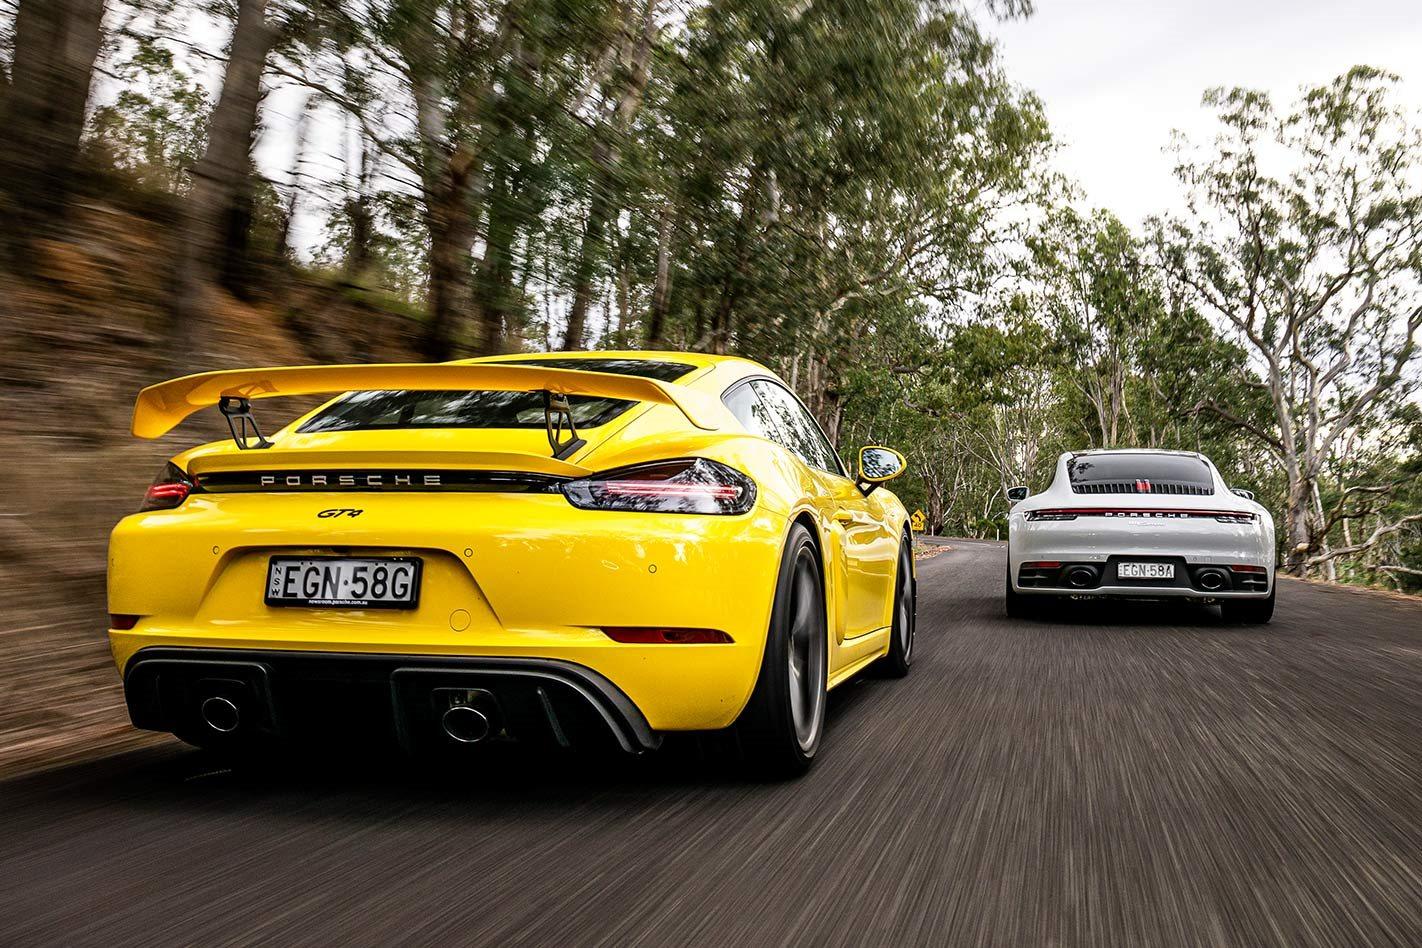 orsche Cayman GT4 v Porsche 911 Carrera comparison test